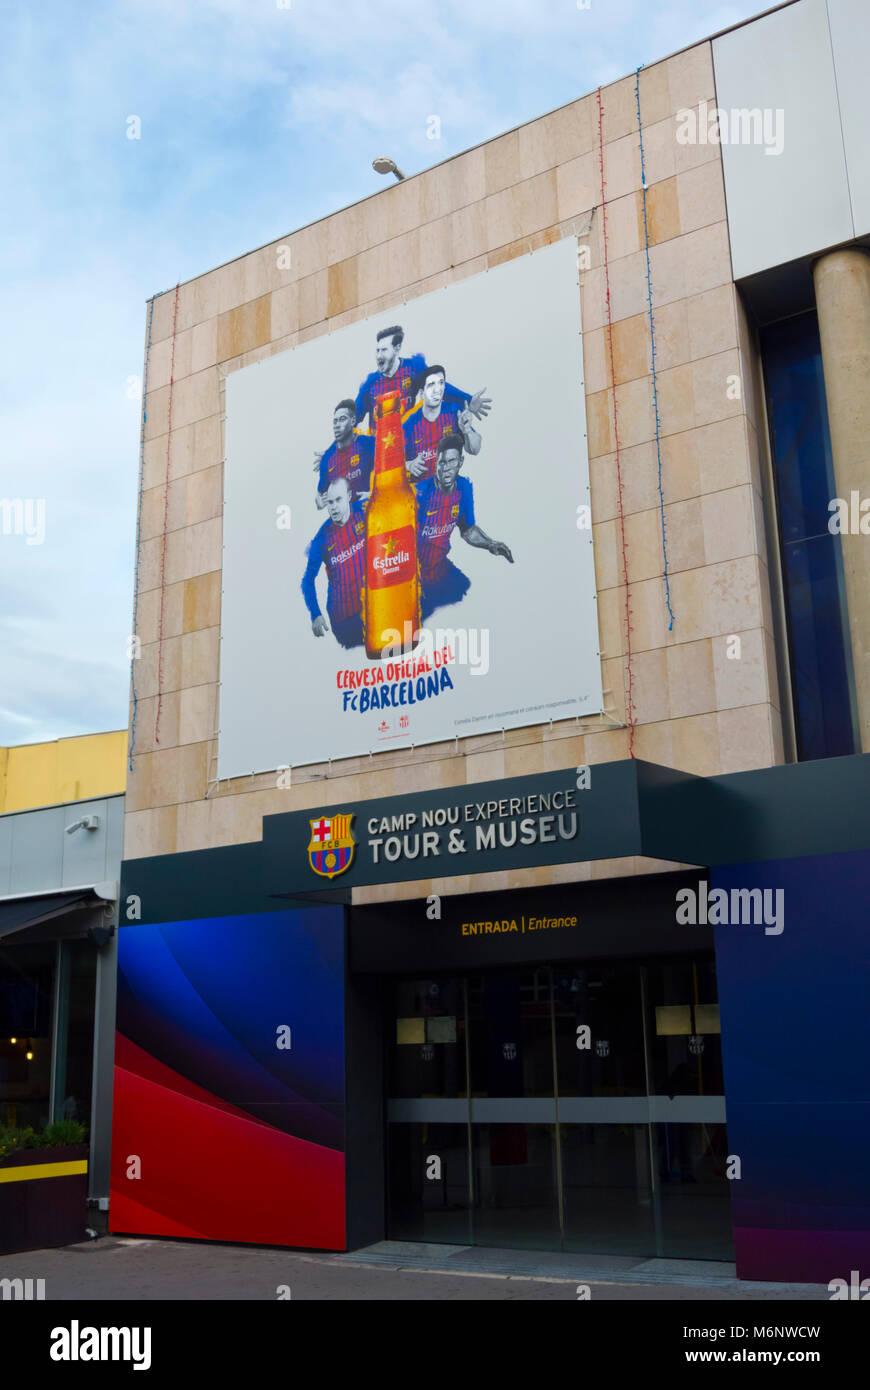 Museu FC Barcelona, Camp Nou, Barcelona, Catalonia, Spain - Stock Image